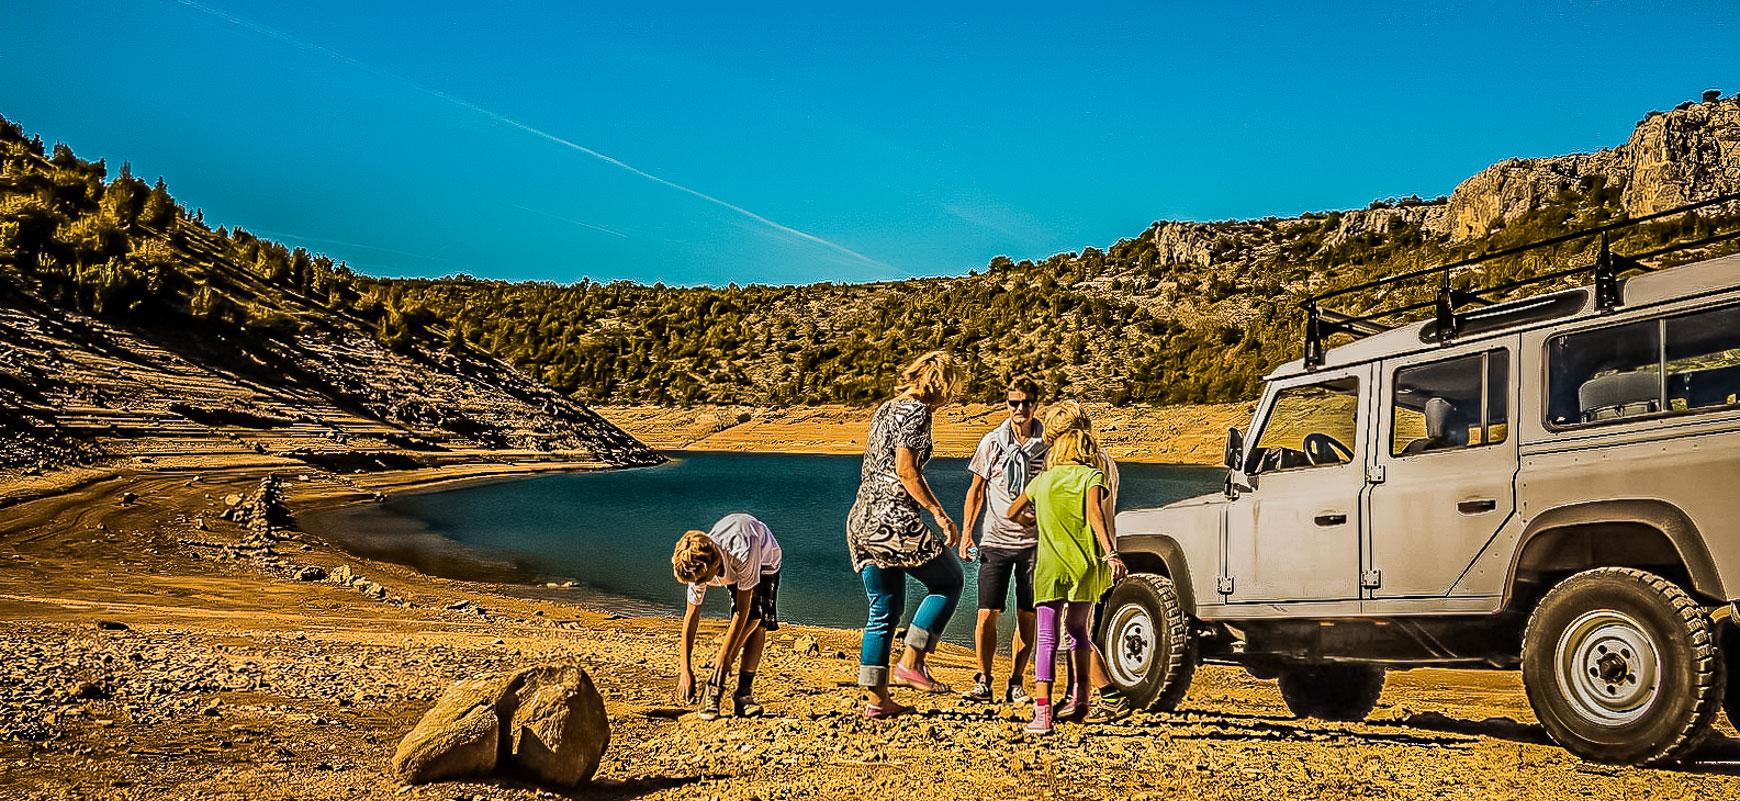 Home-page-Jeep-safari-Dalmatinska-zagora-